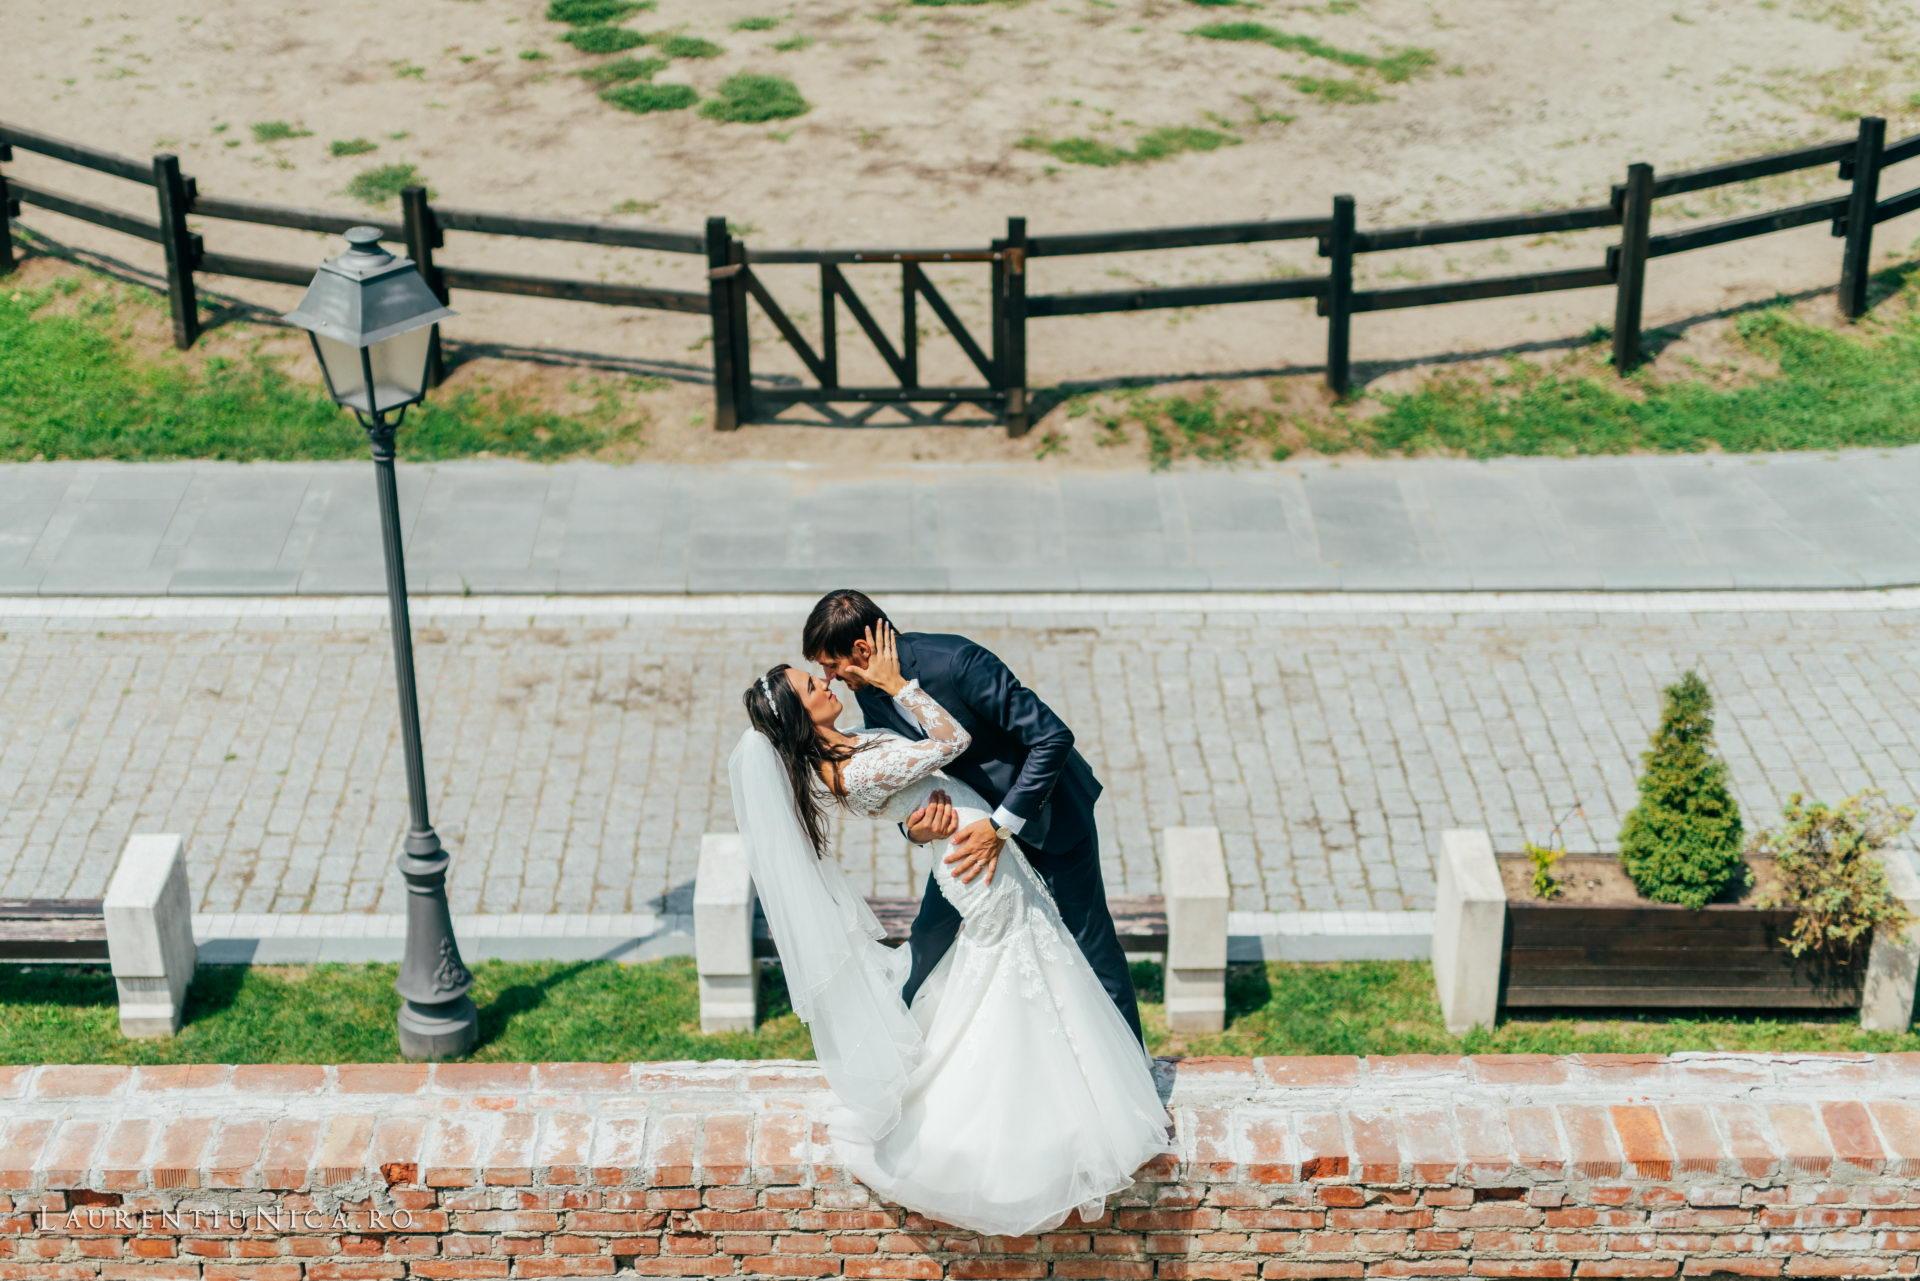 cristina_si_ovidiu-after-wedding-alba-iulia_fotograf_laurentiu_nica_25